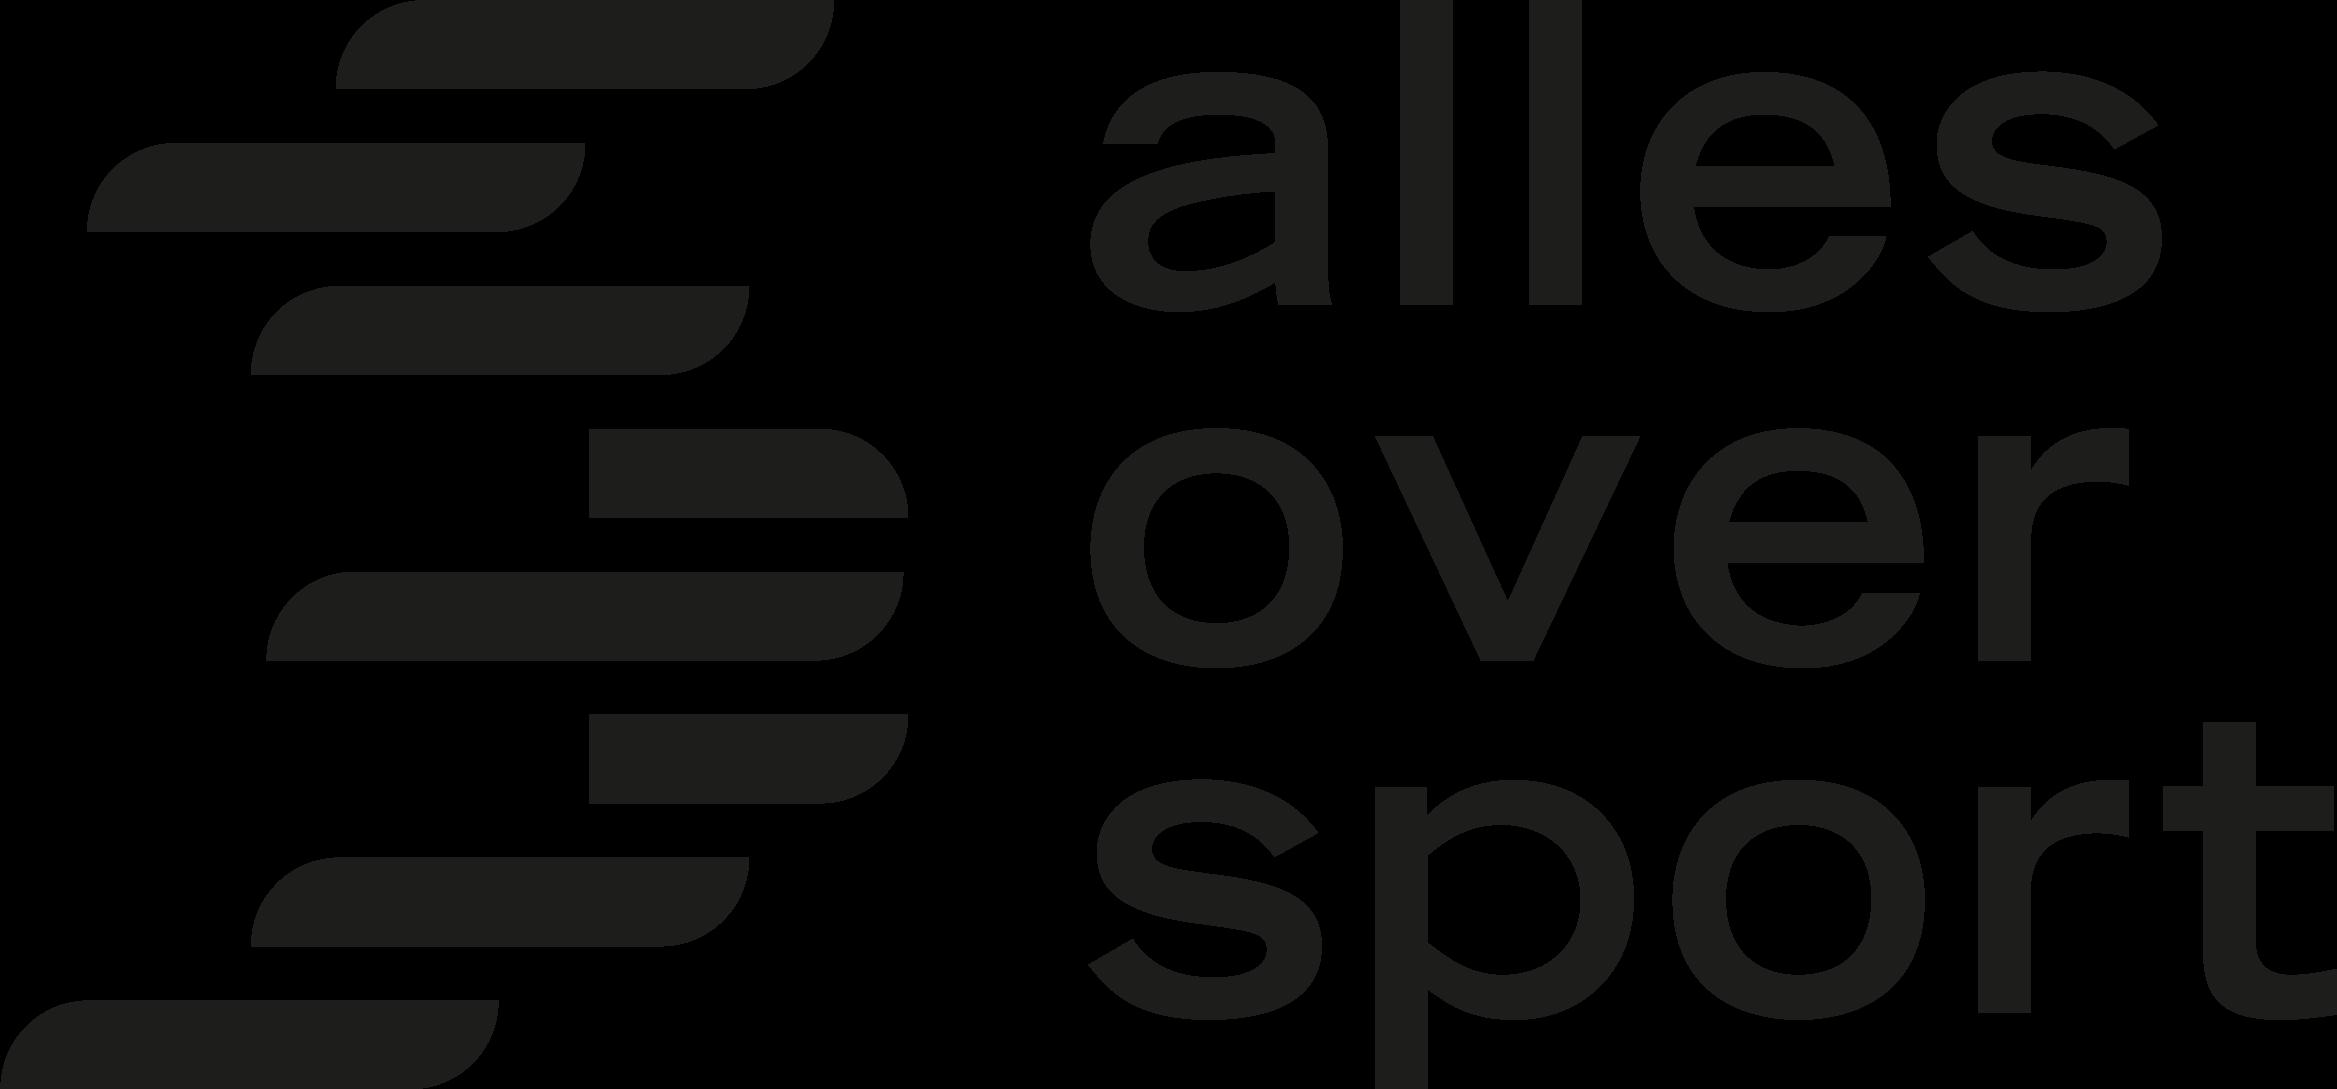 Allesoversport.nl